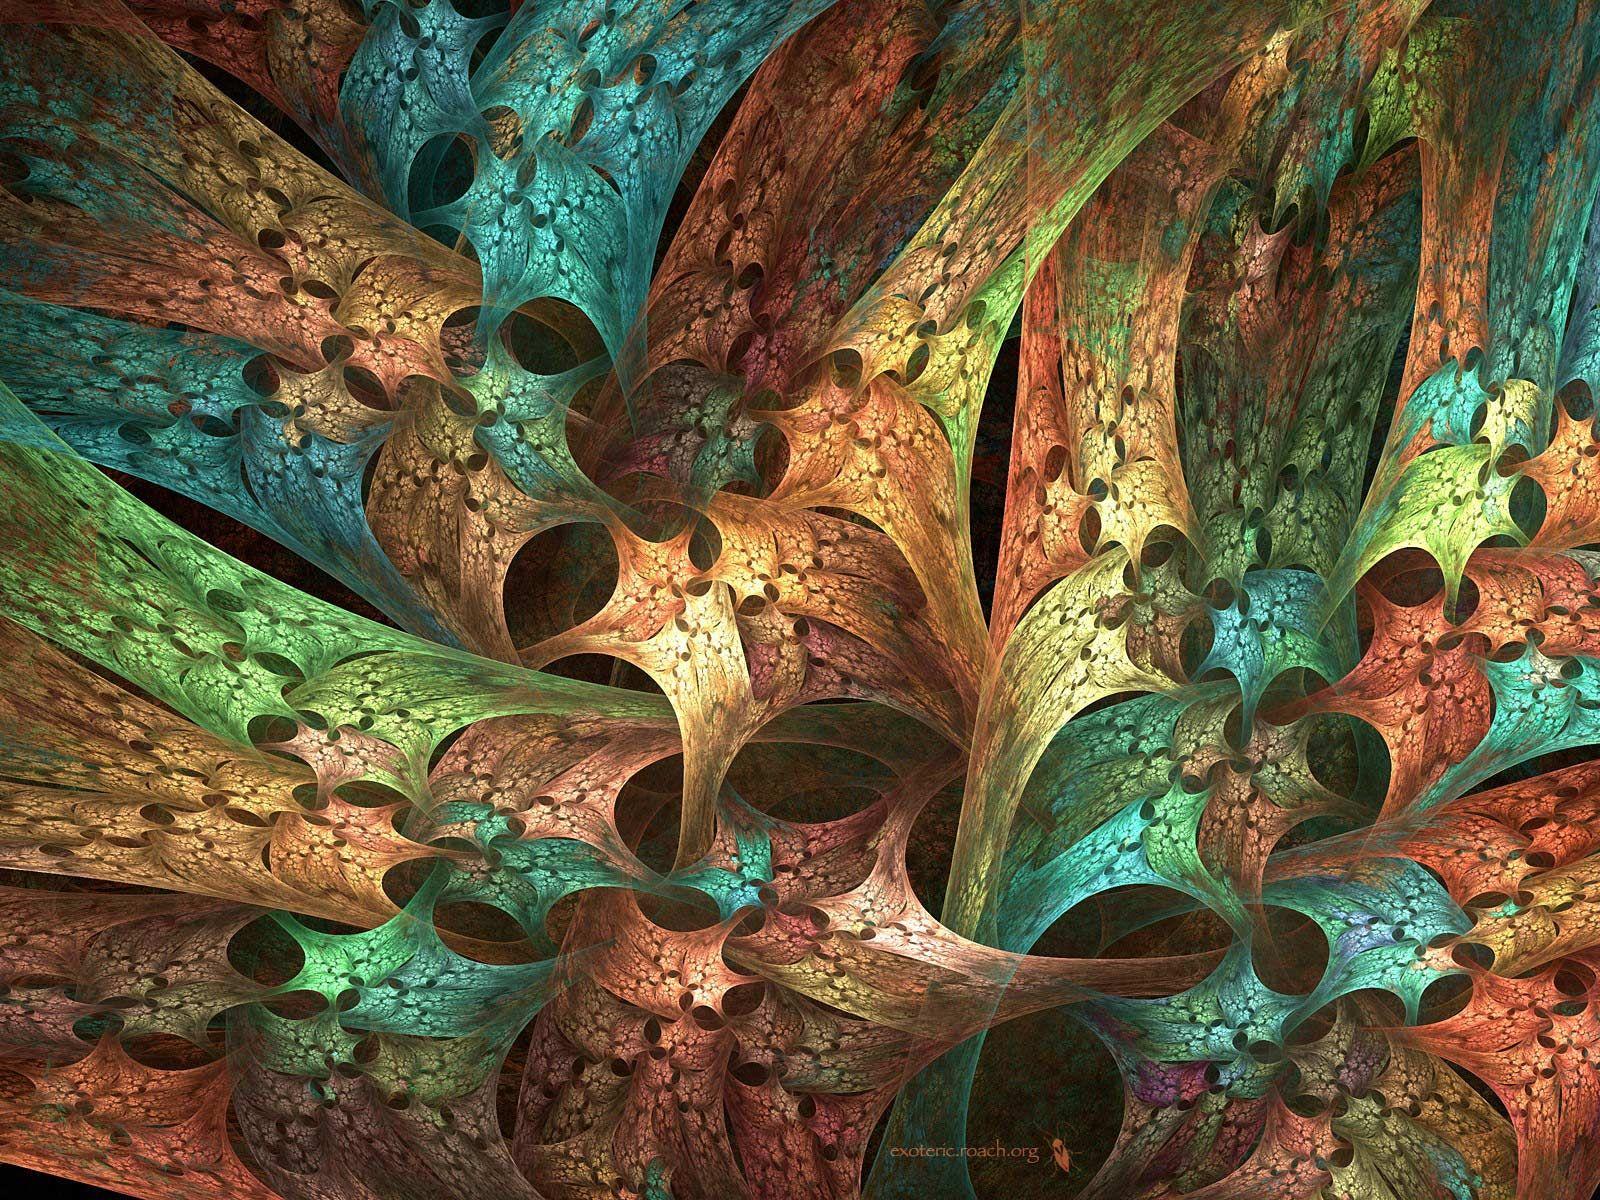 Desktop Wallpaper 3d-art Lace Textures & Patterns Fractals